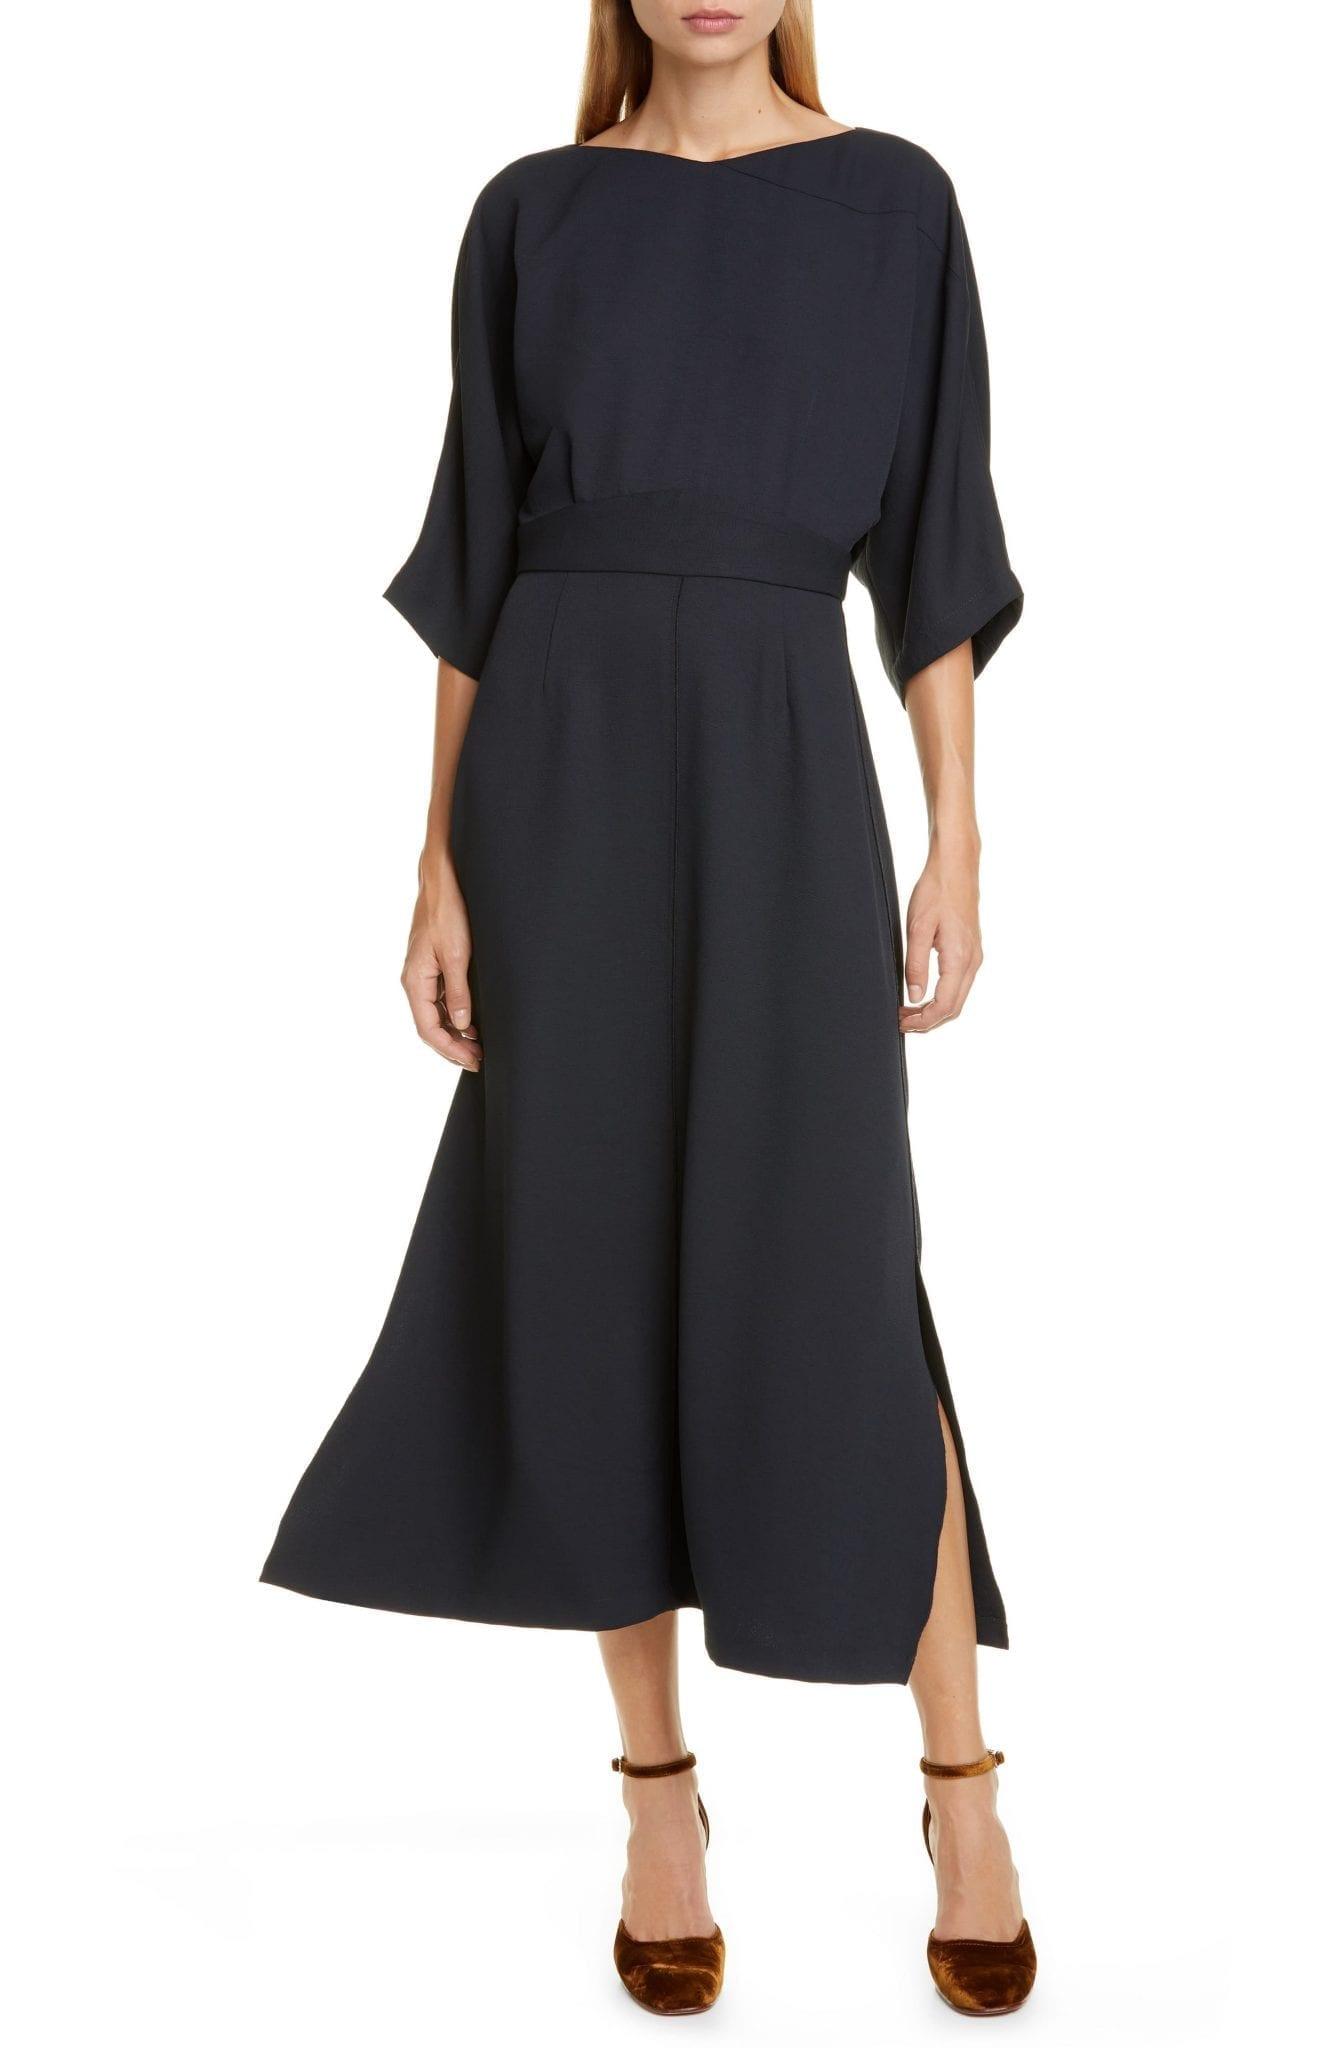 RACHEL COMEY Lyss Midi Dress